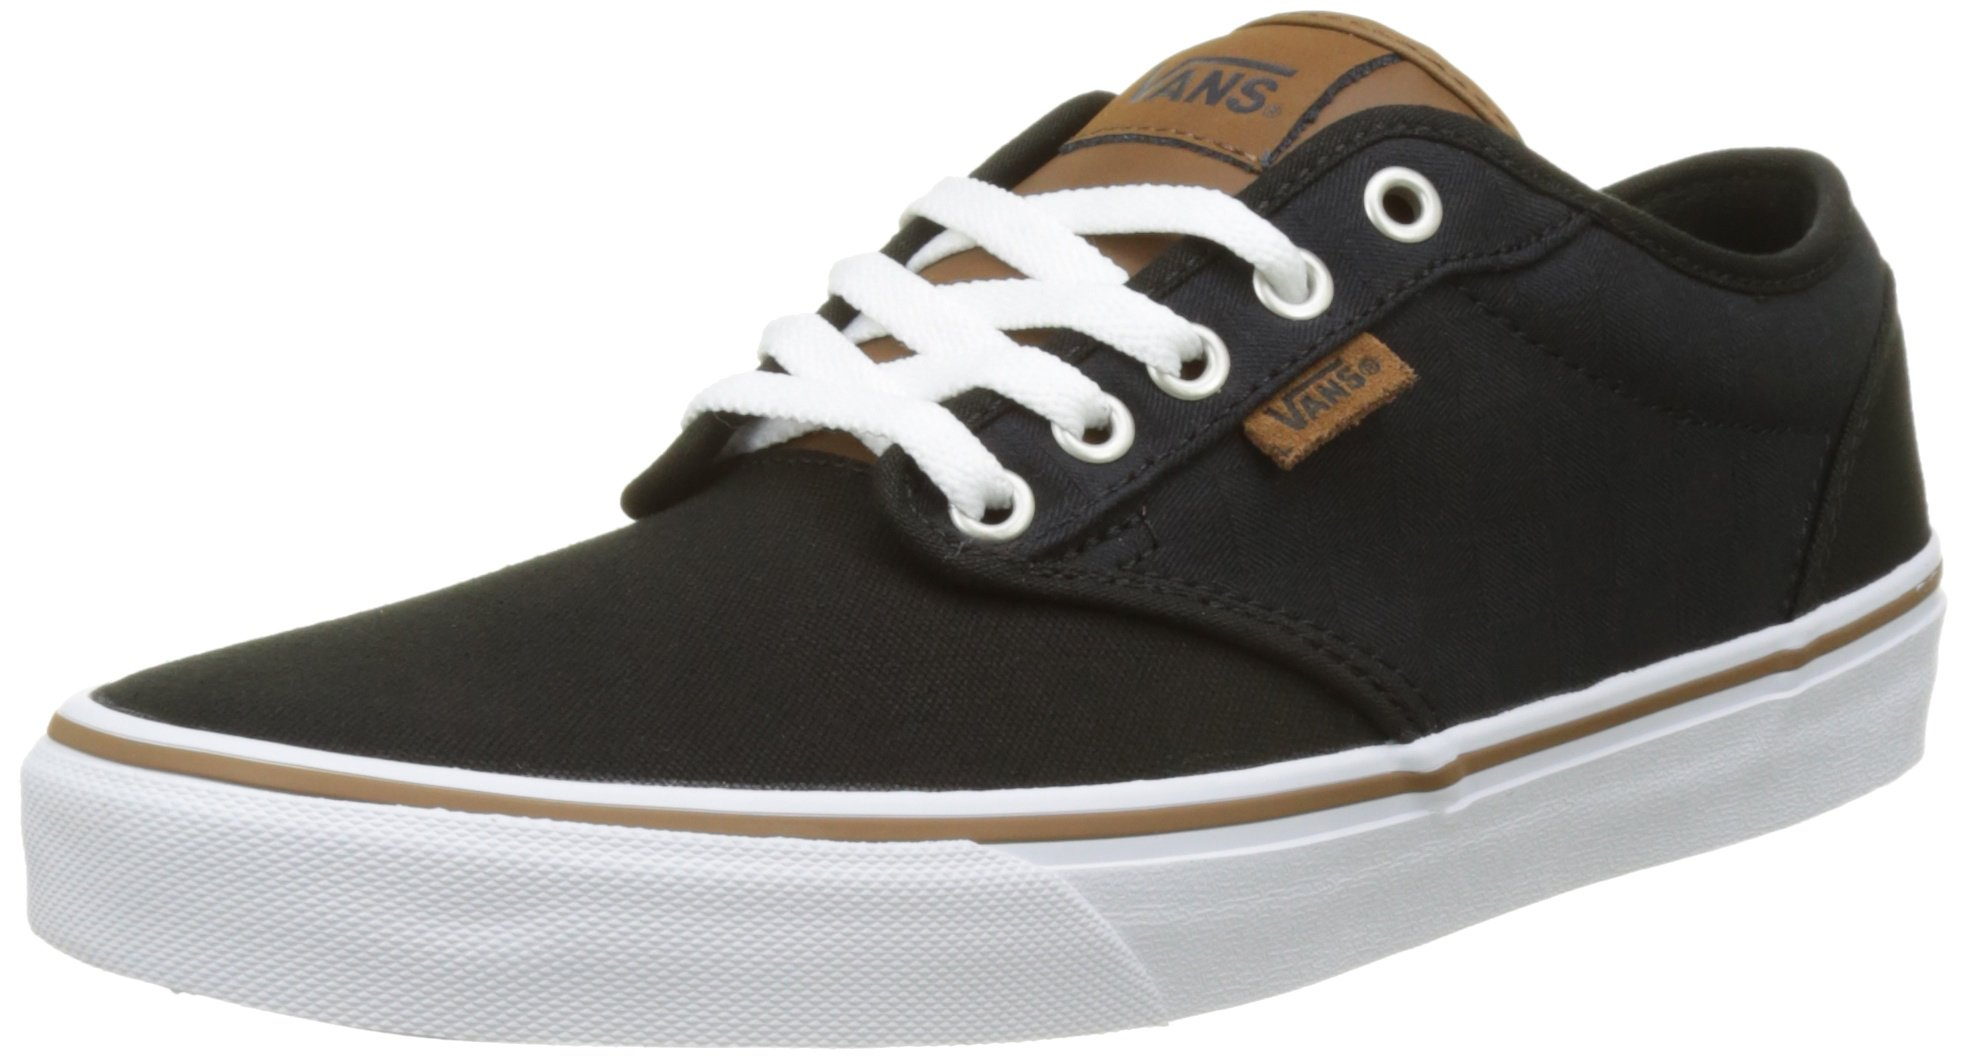 fe030b4fa04e27 Galleon - Vans Atwood Shoes UK 9 C L Black Check